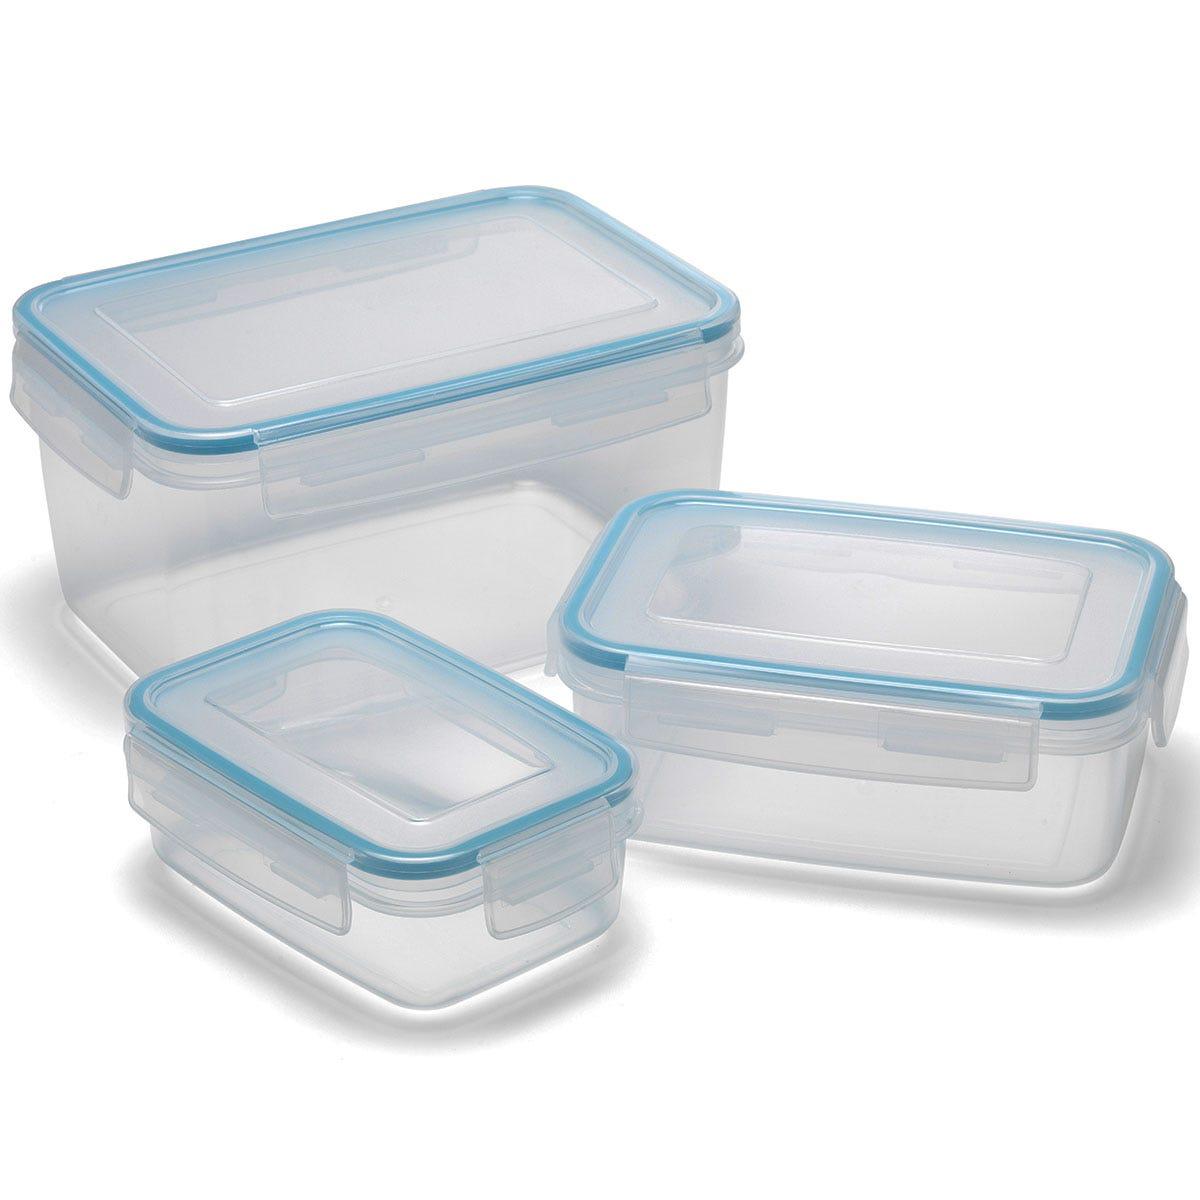 Image of Addis Clip & Close Rectangular 3 Piece Food Storage Set